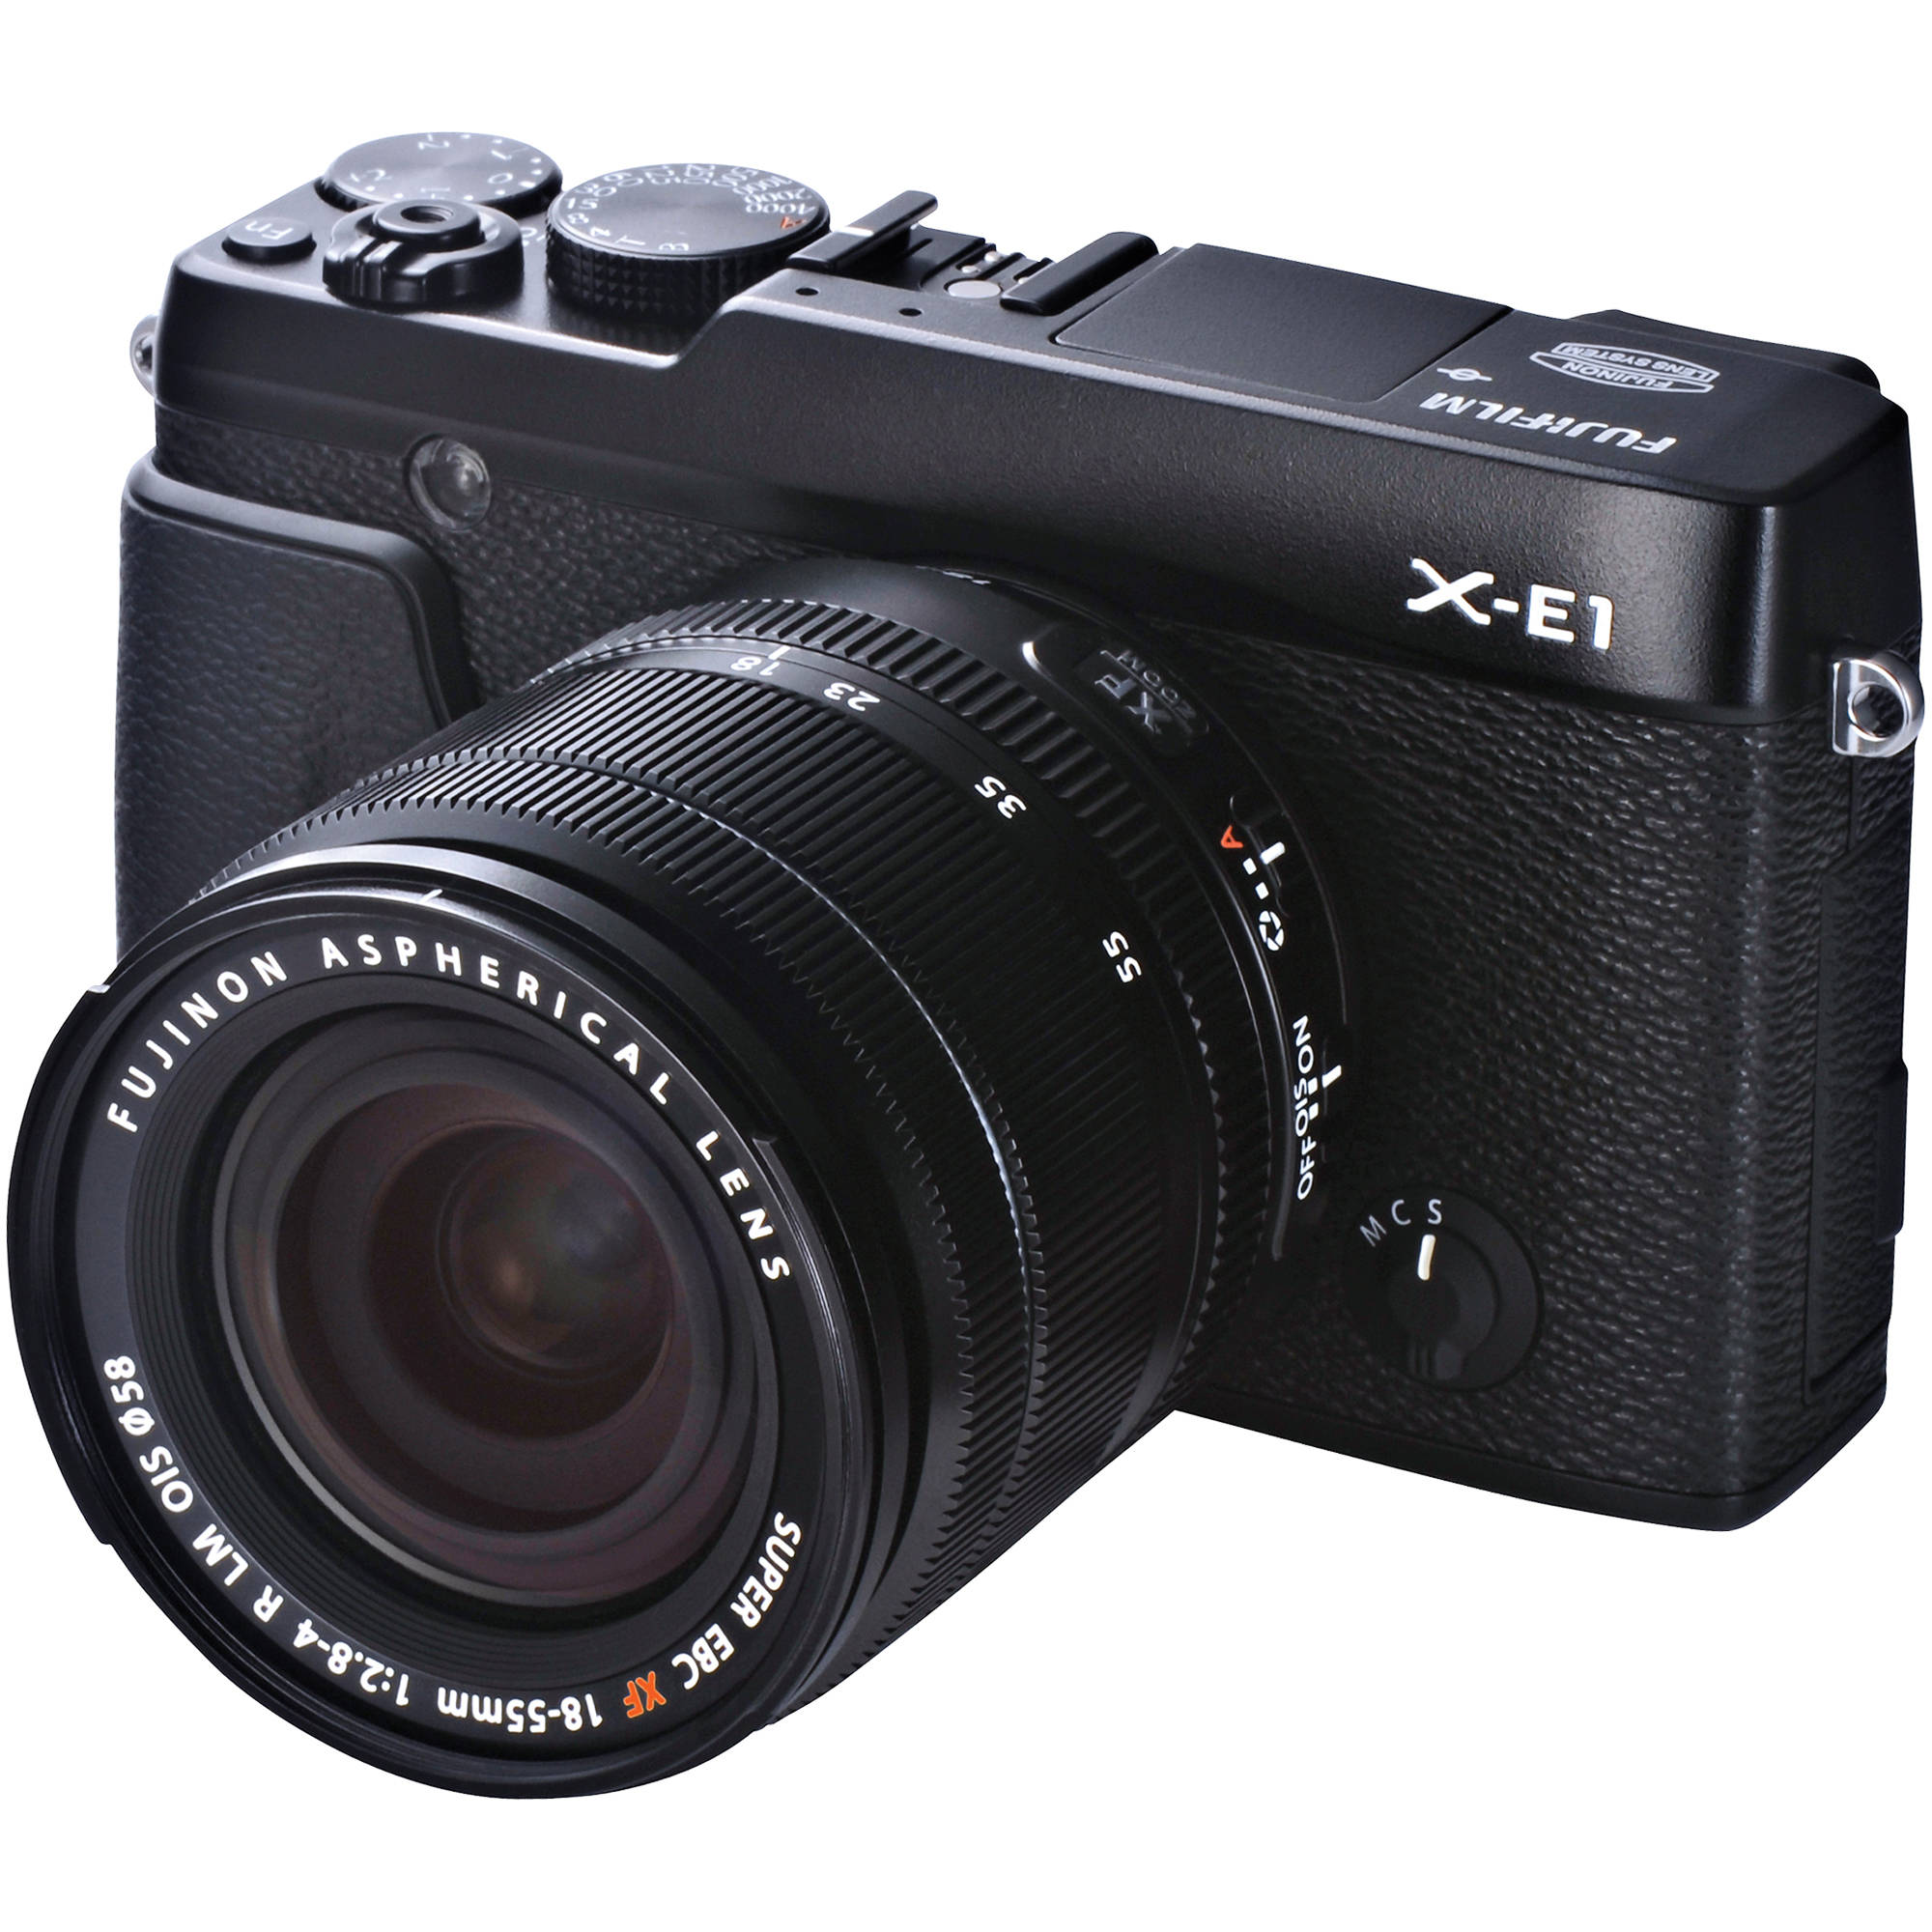 fujifilm x e1 digital camera kit with xf 18 55mm 16276467 b h. Black Bedroom Furniture Sets. Home Design Ideas